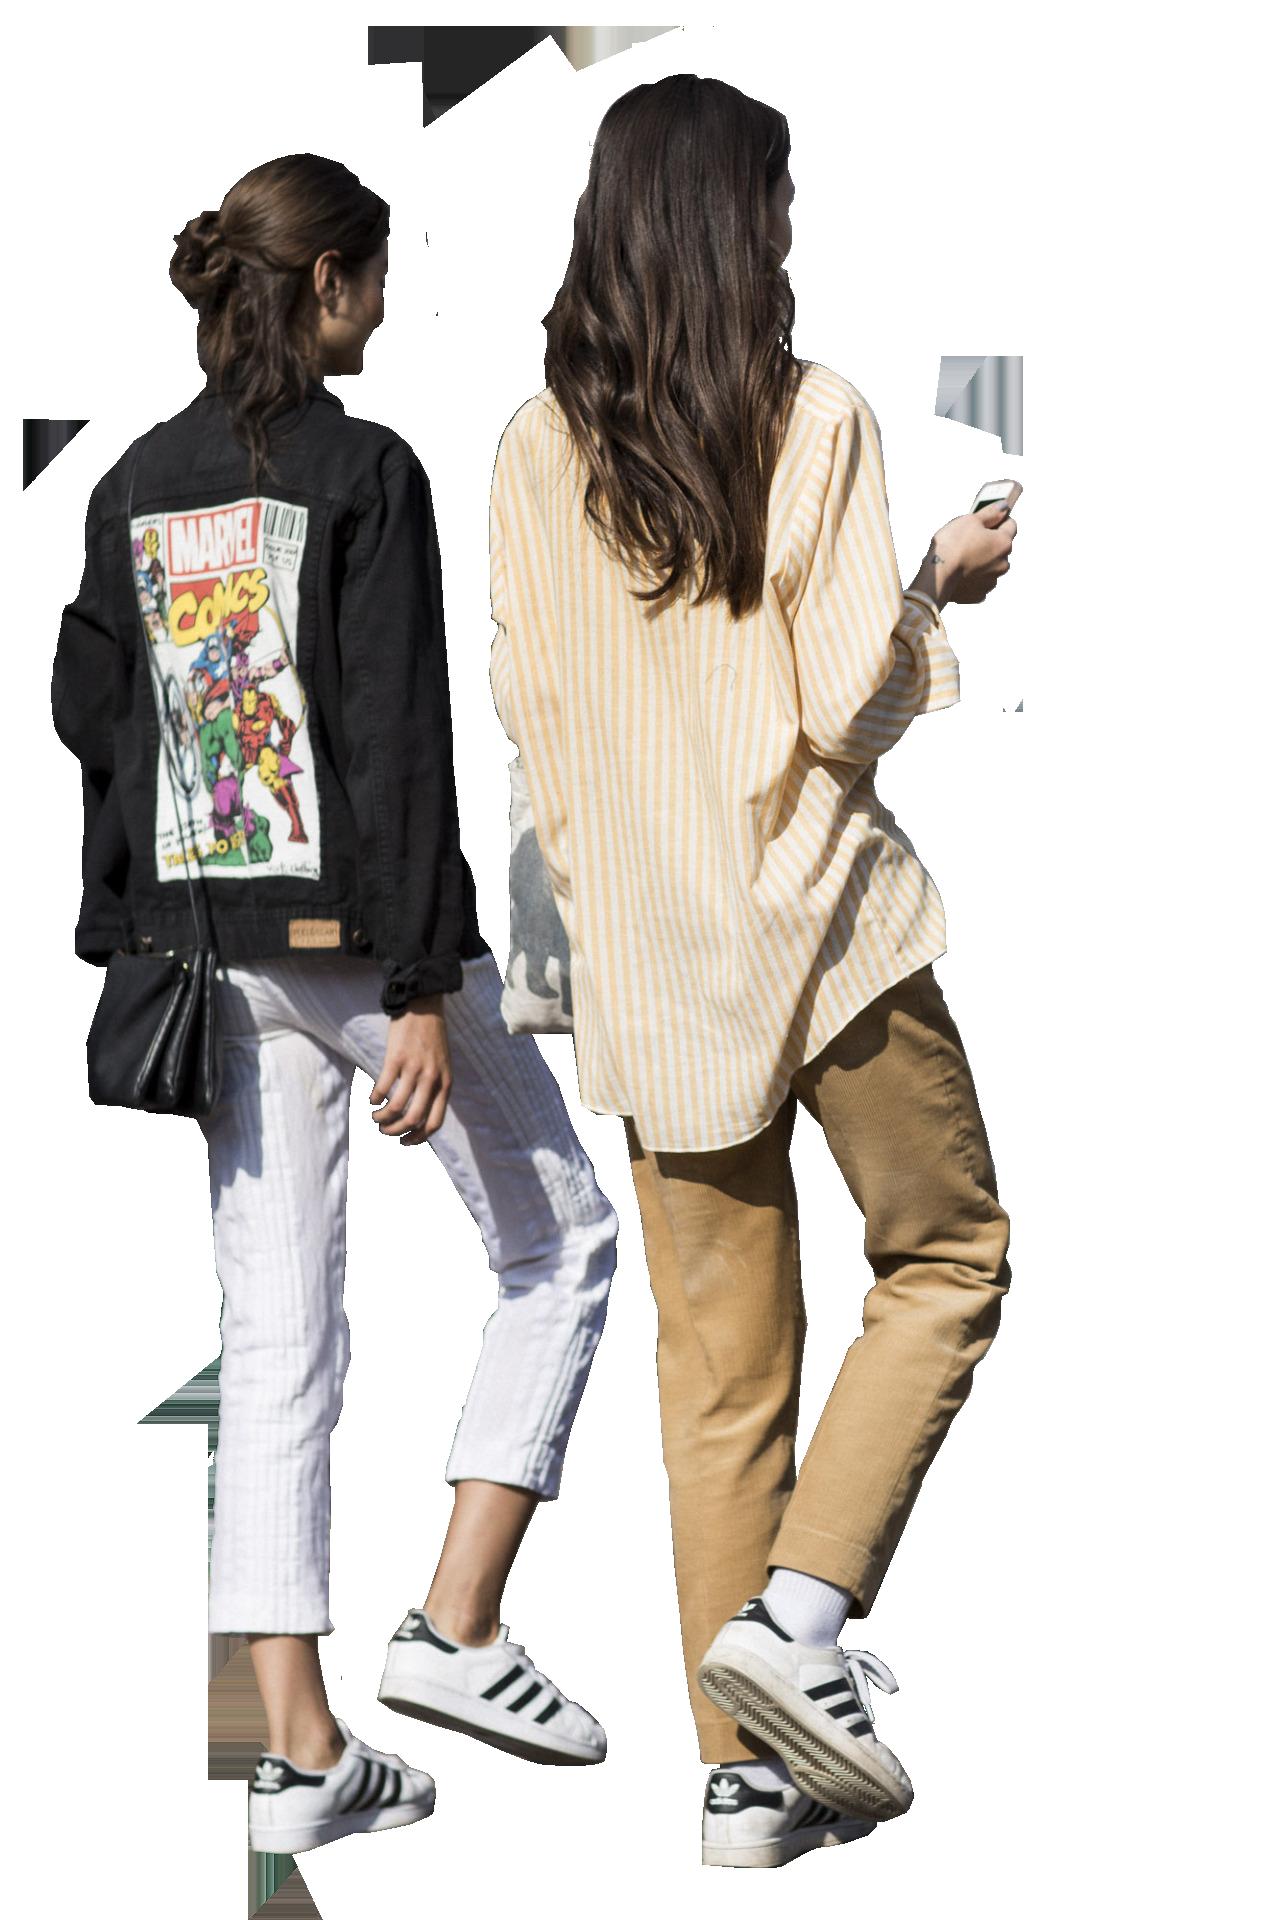 womens walking | 실루엣, 3d 그림, 패션